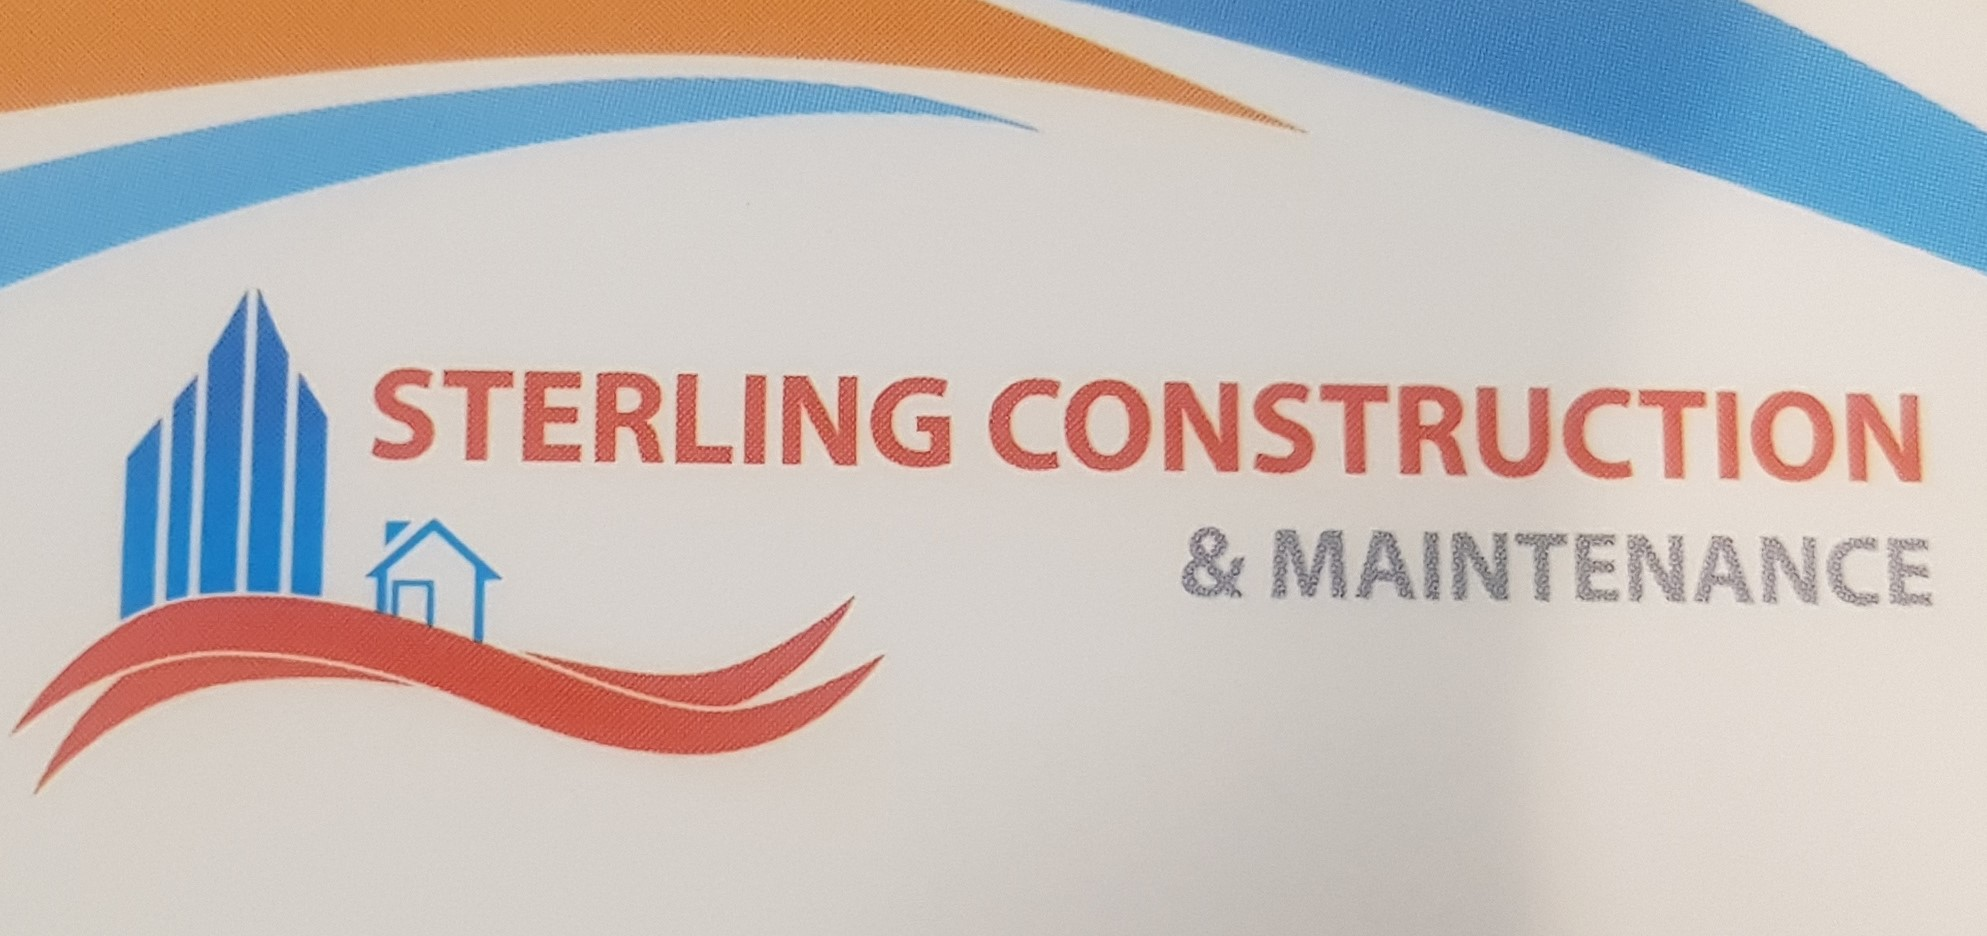 Sterling Construction & Maintenance